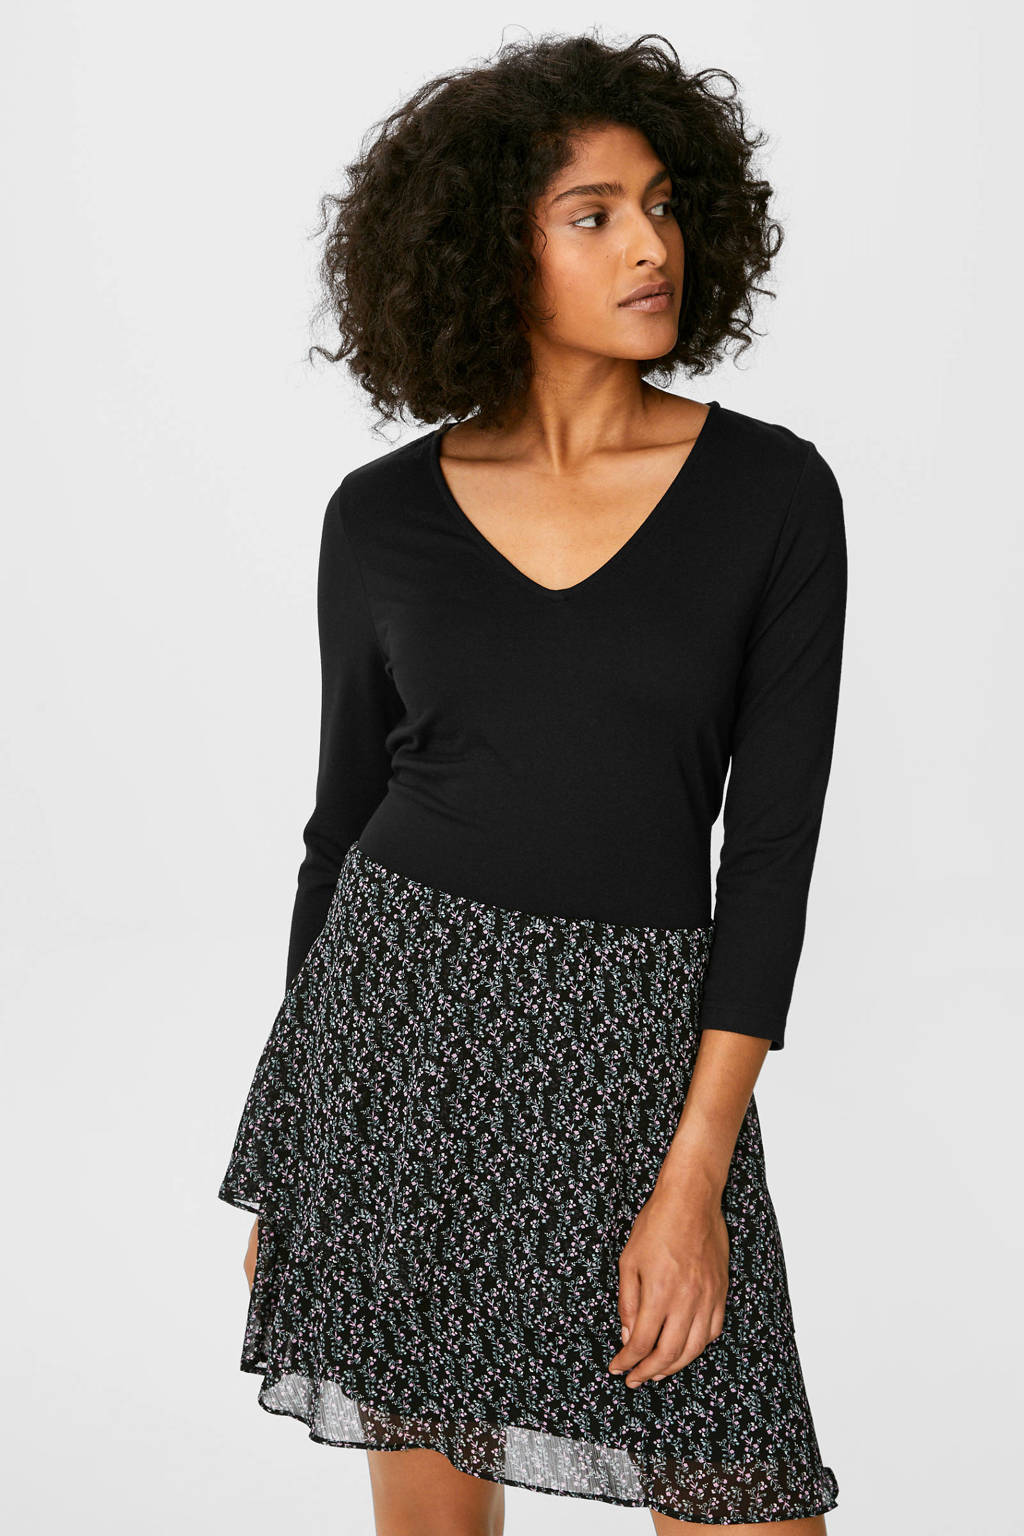 C&A gebloemde semi-transparante jurk zwart/multi, Zwart/multi